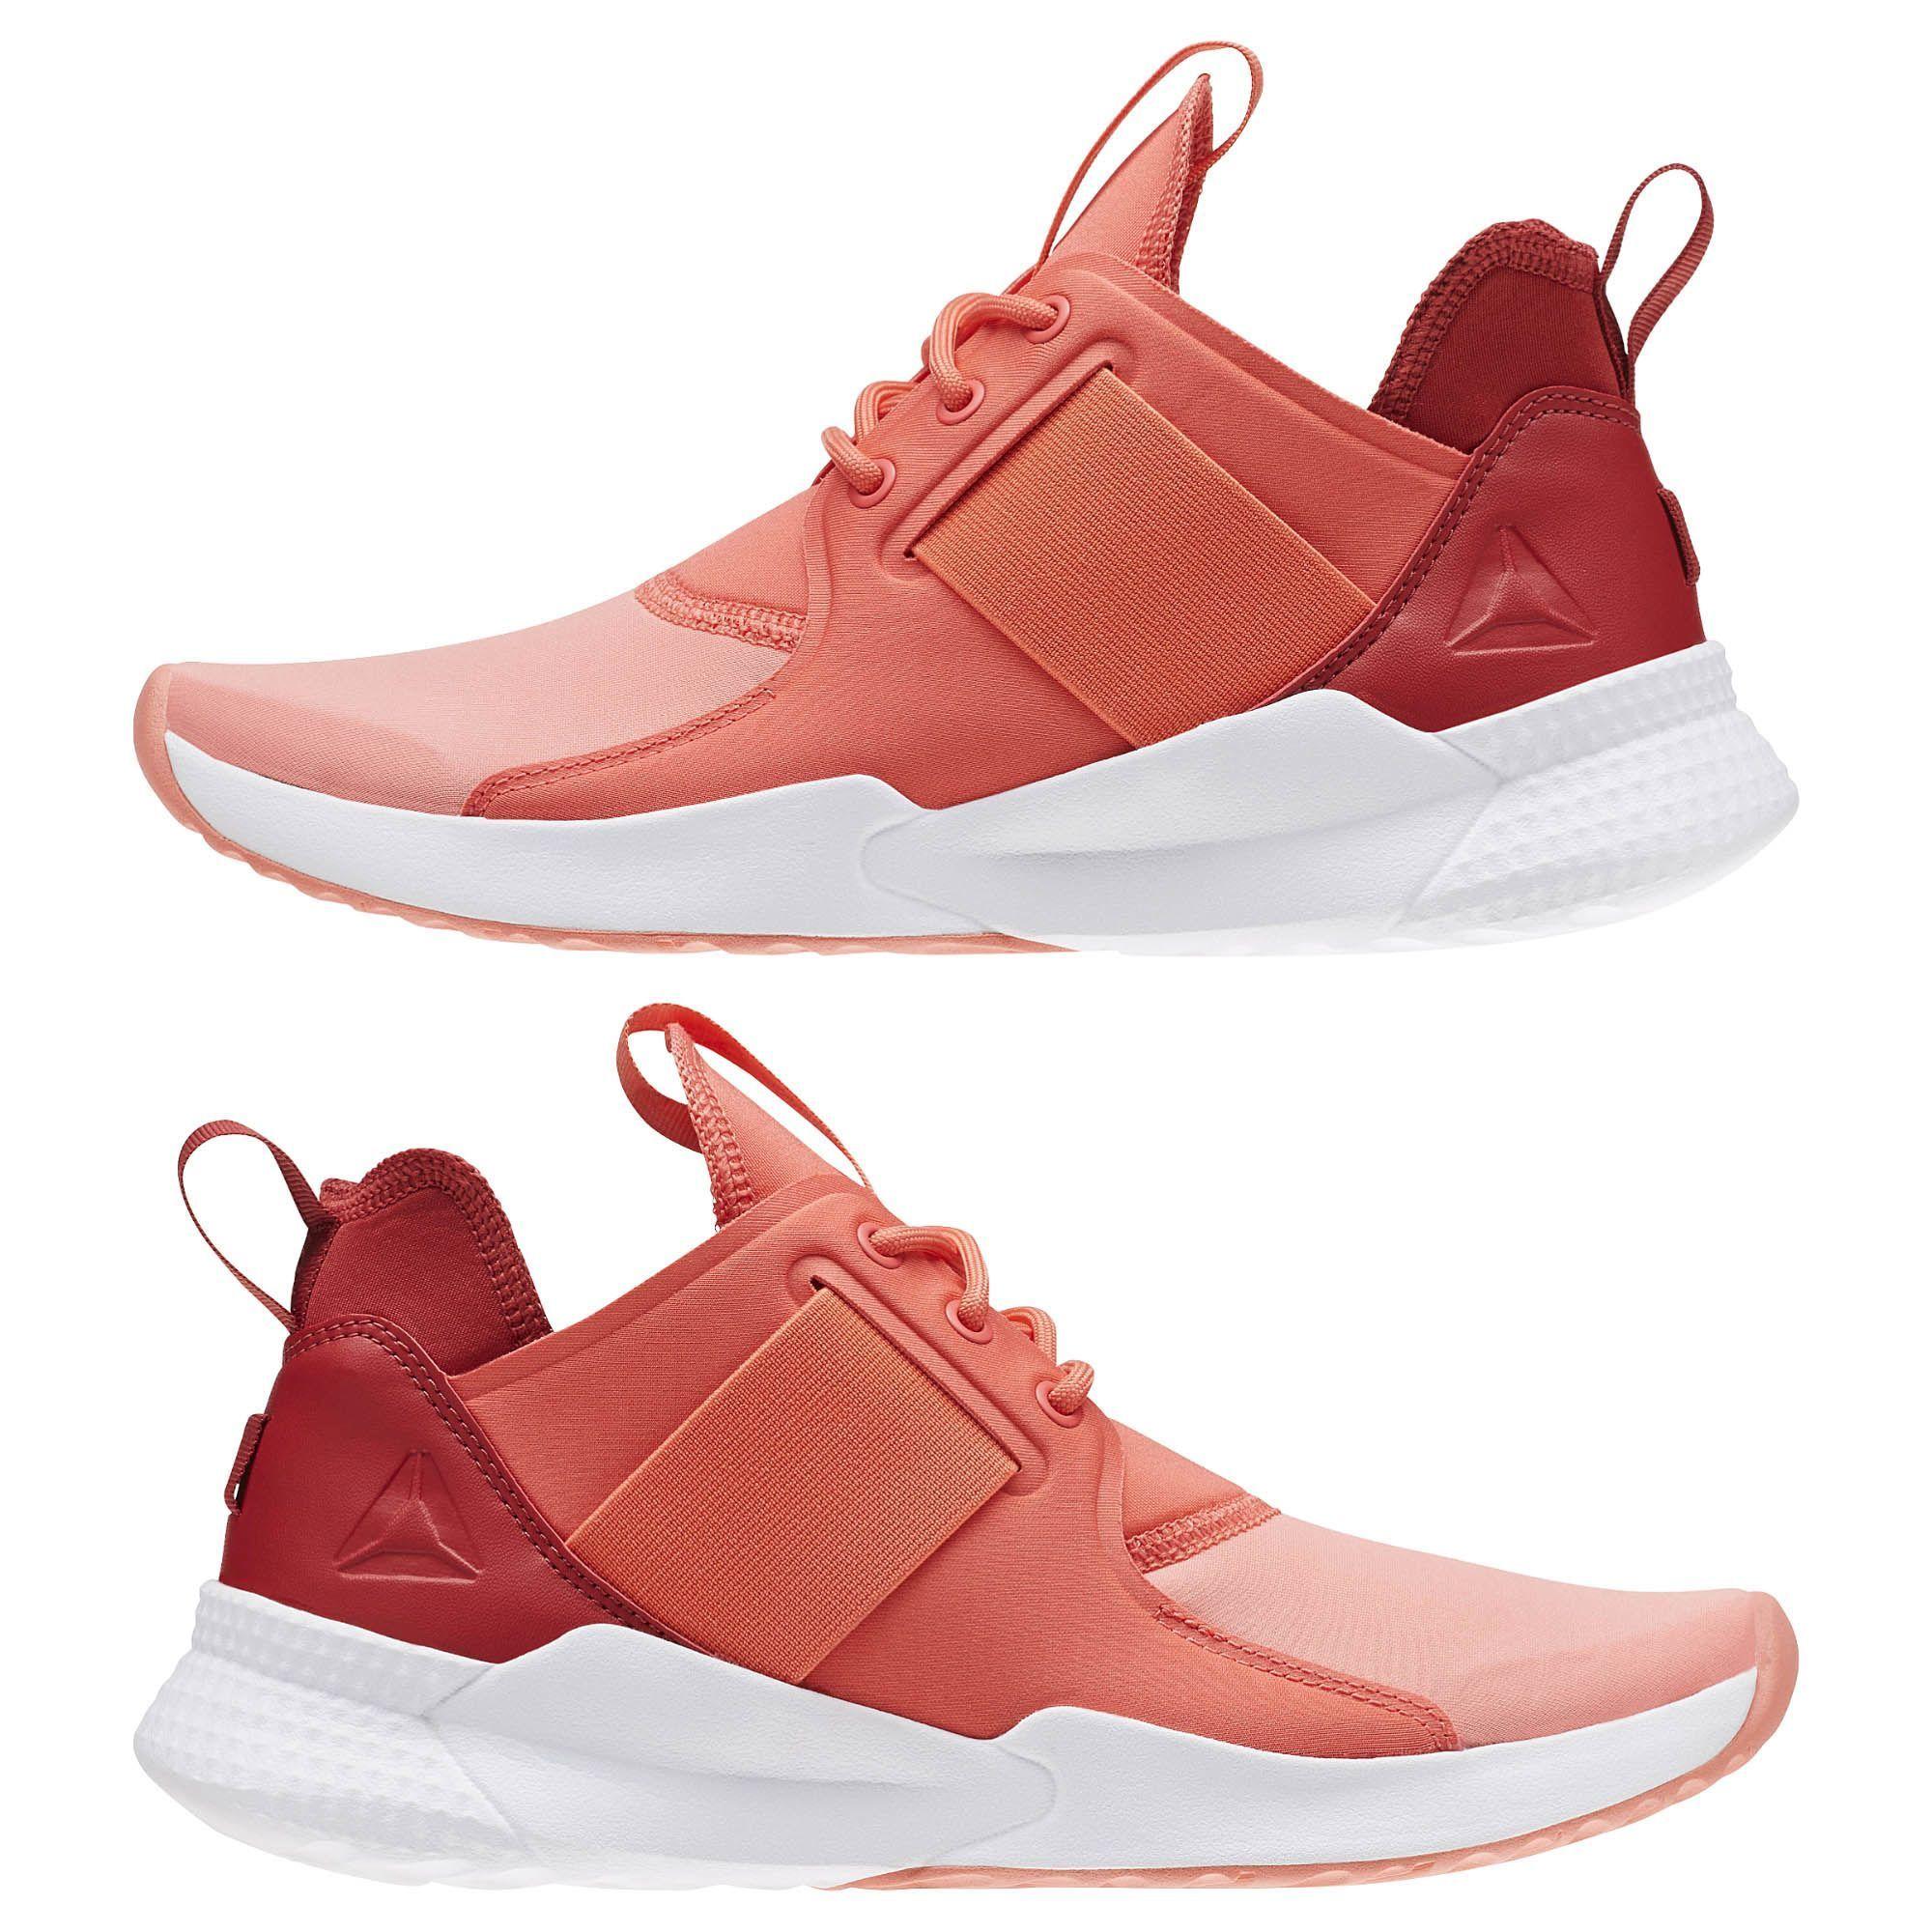 the best attitude 73dcd 99ece Reebok - Pilox 1.0 Sports Footwear, Footwear Shoes, Shoes Sport, Sports  Shoes,